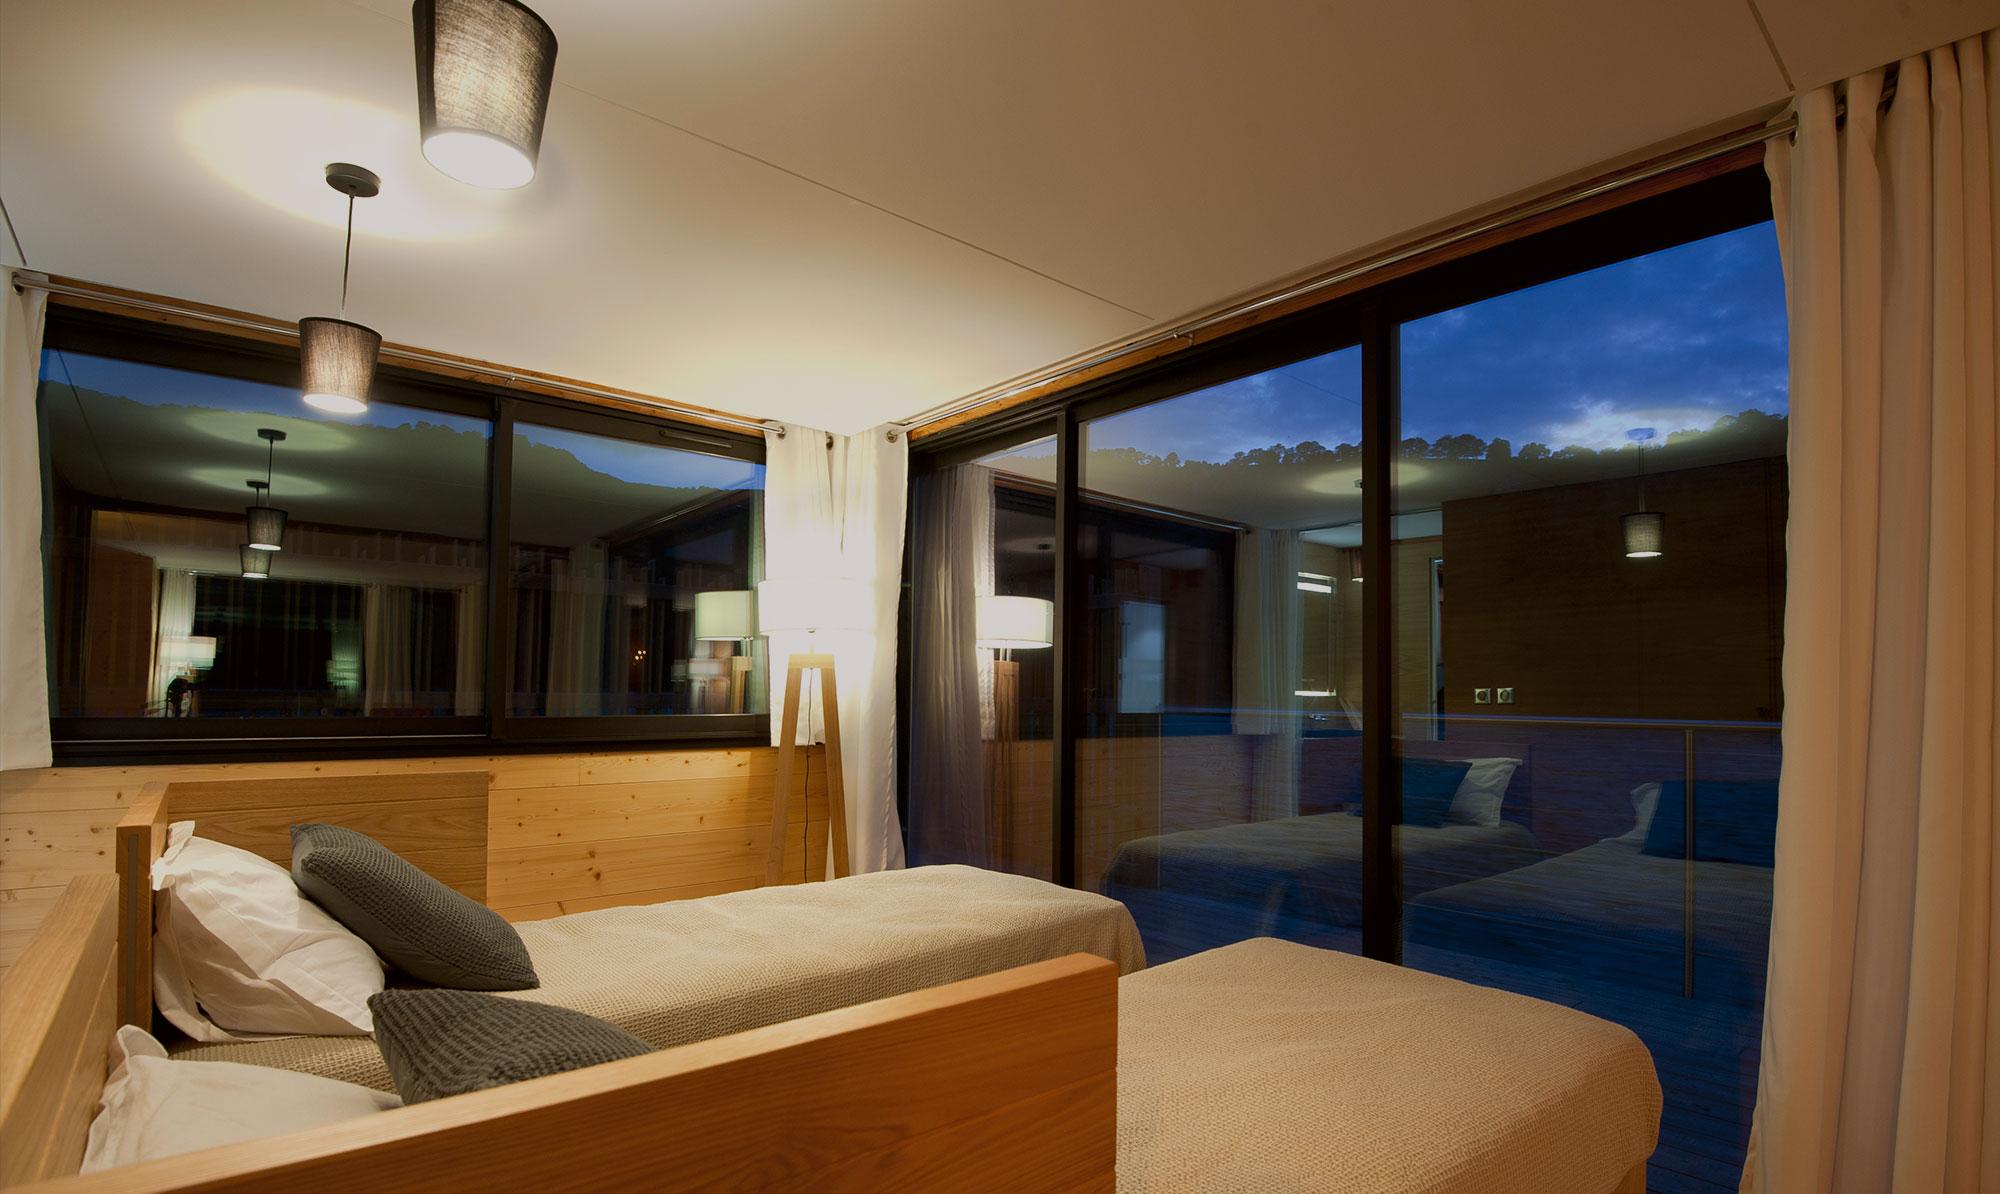 cabane mobilier design